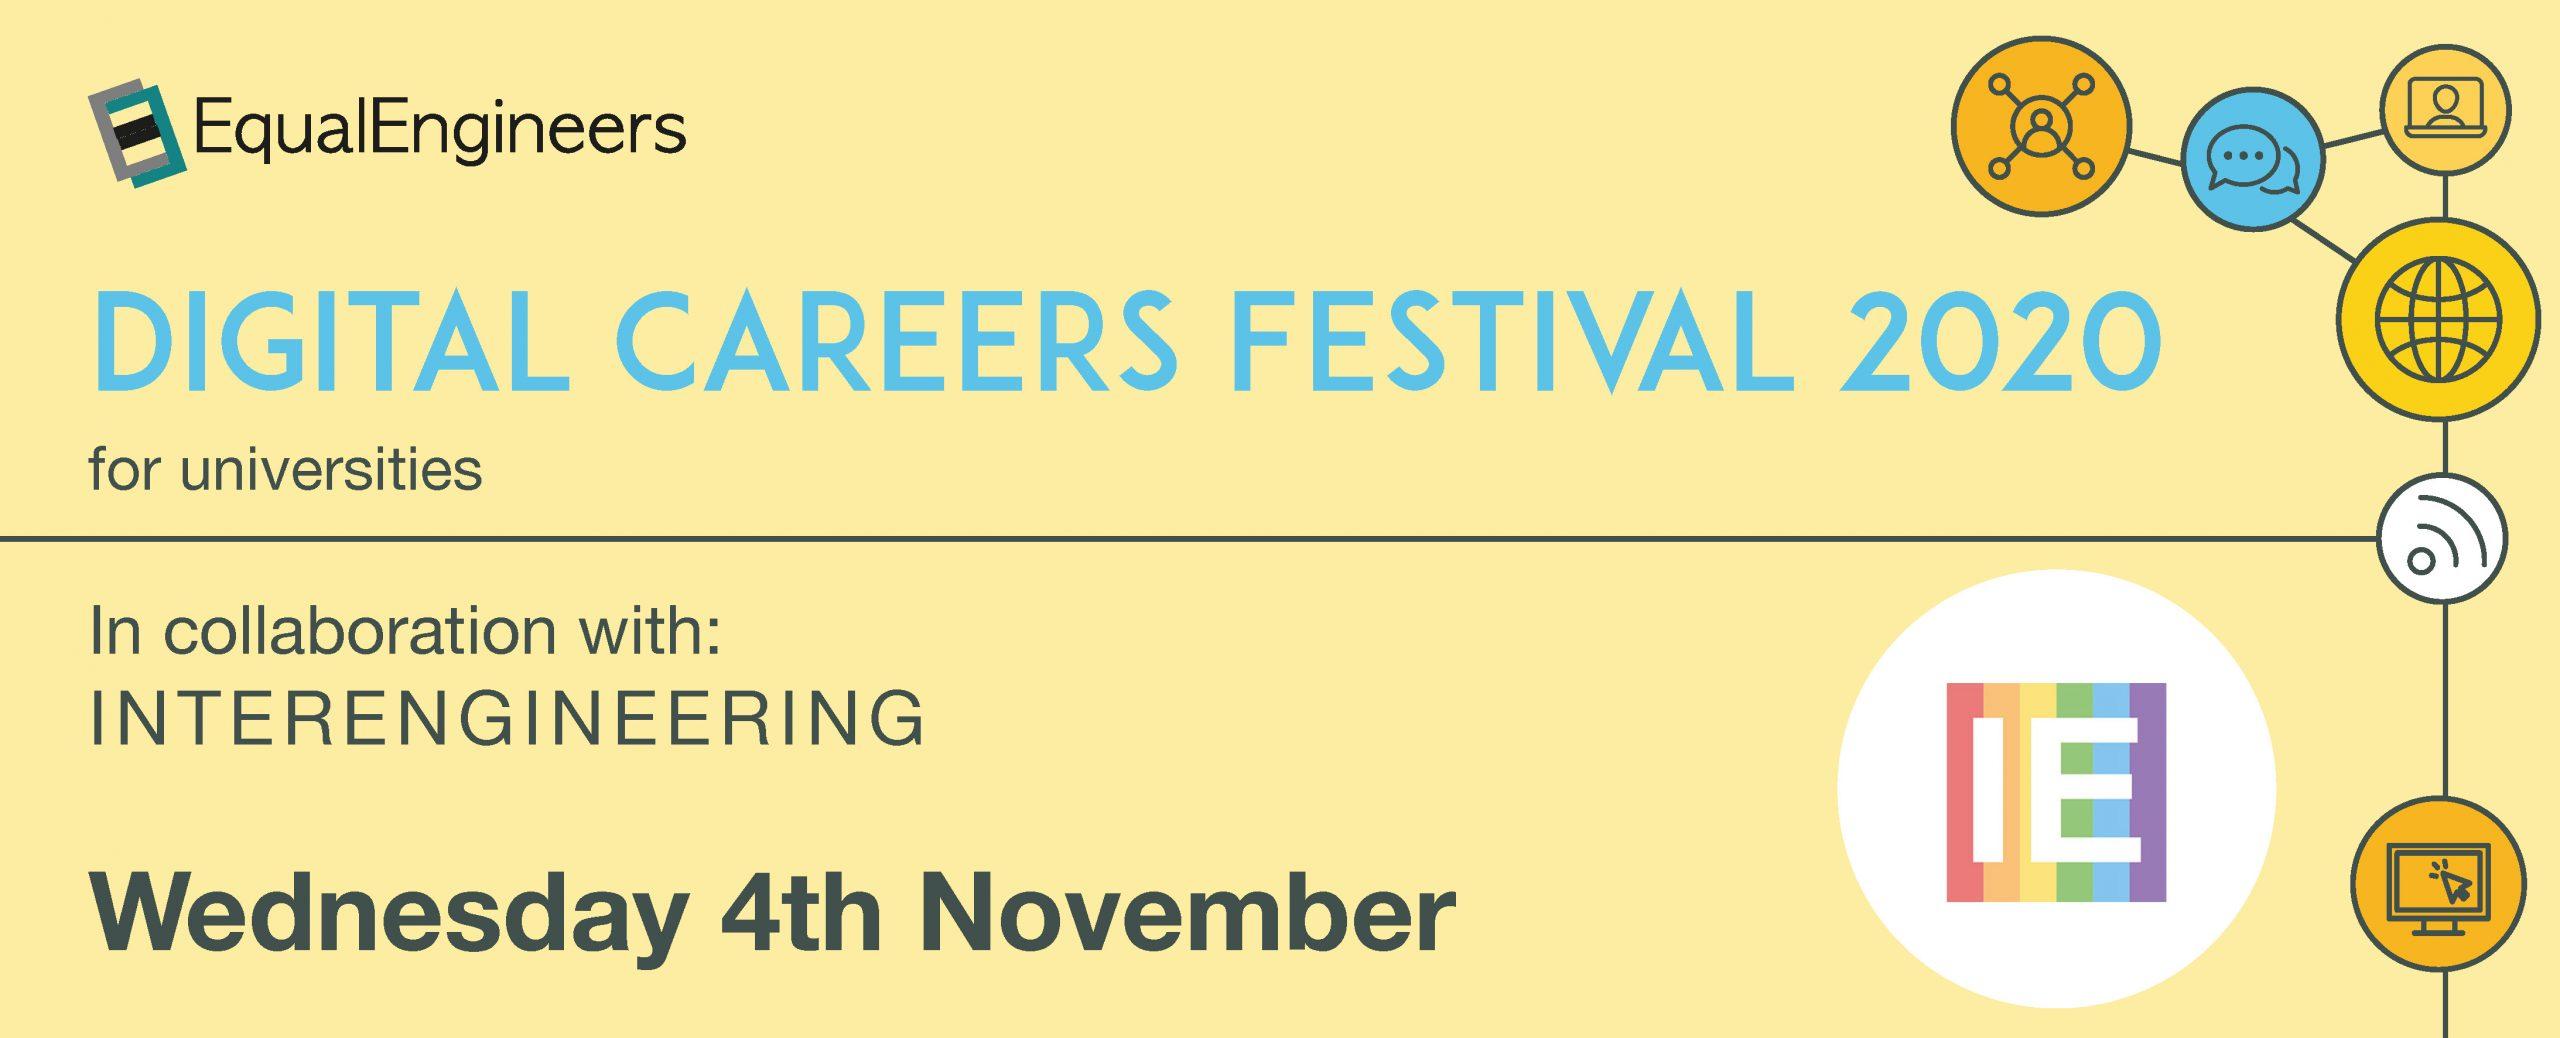 Digital Careers Festival for Universities - 4th November